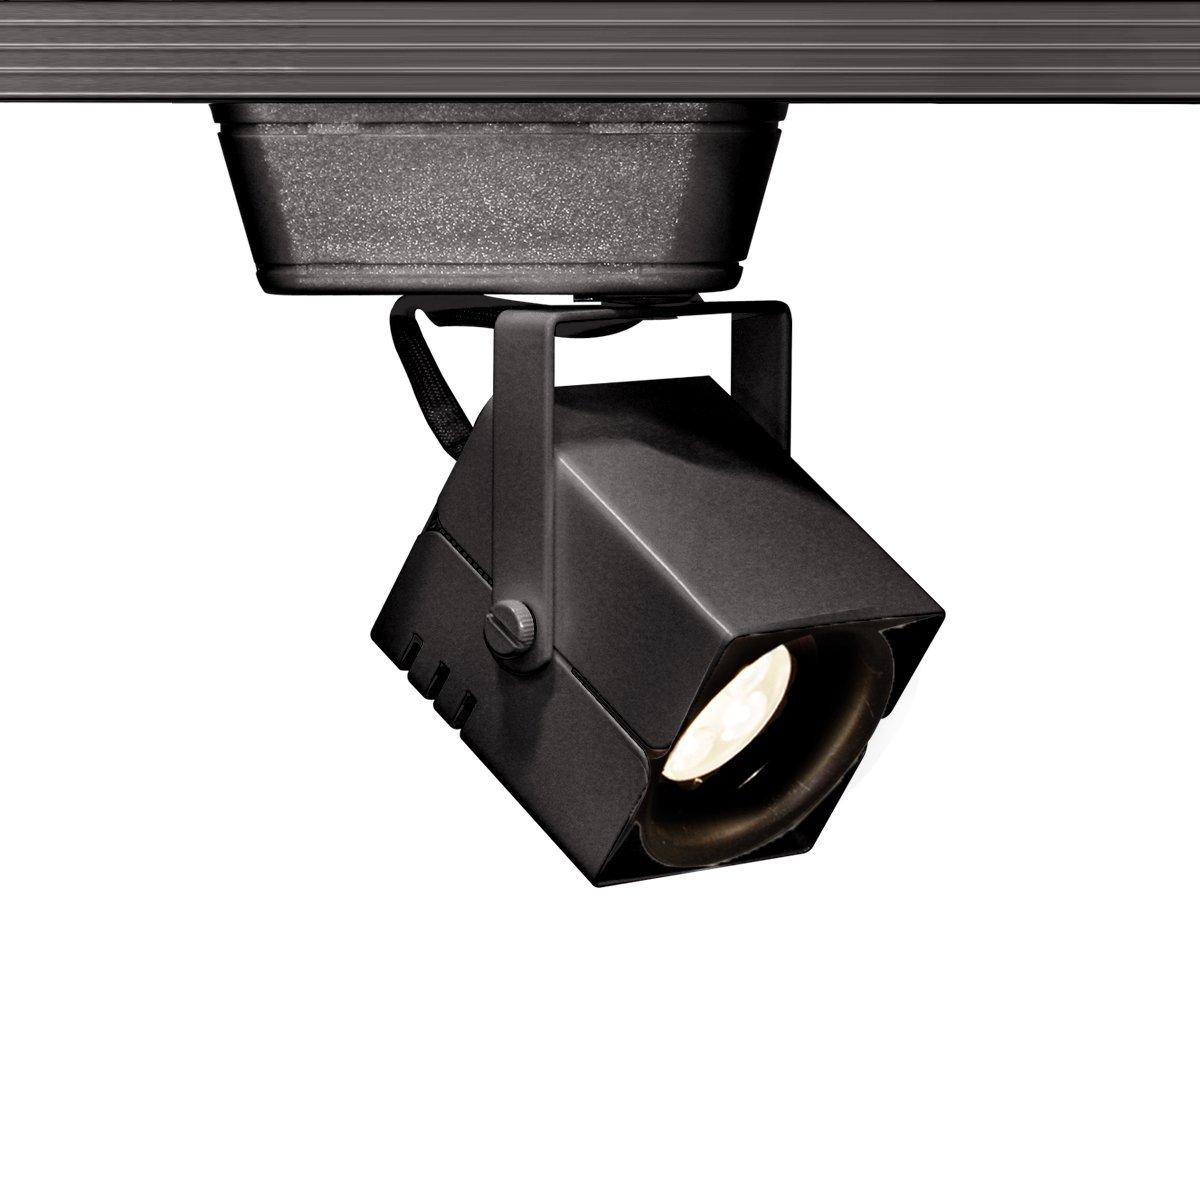 WAC Lighting LHT-801LED-BK Low Voltage - 120V Track Luminaire - L Track